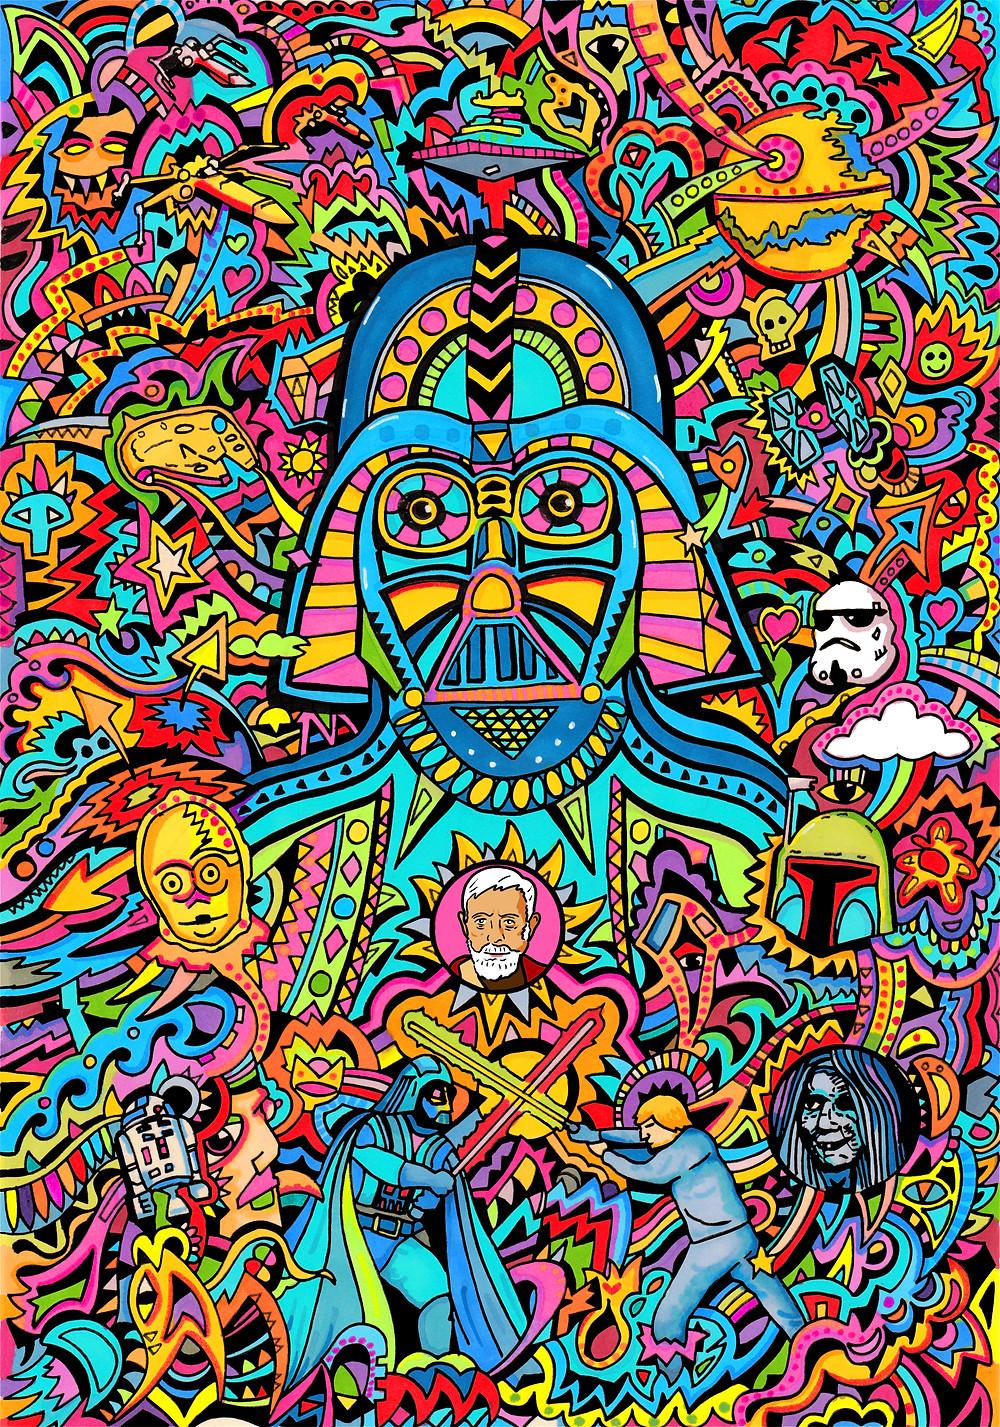 Darth Vader, pens, paper, Photoshop